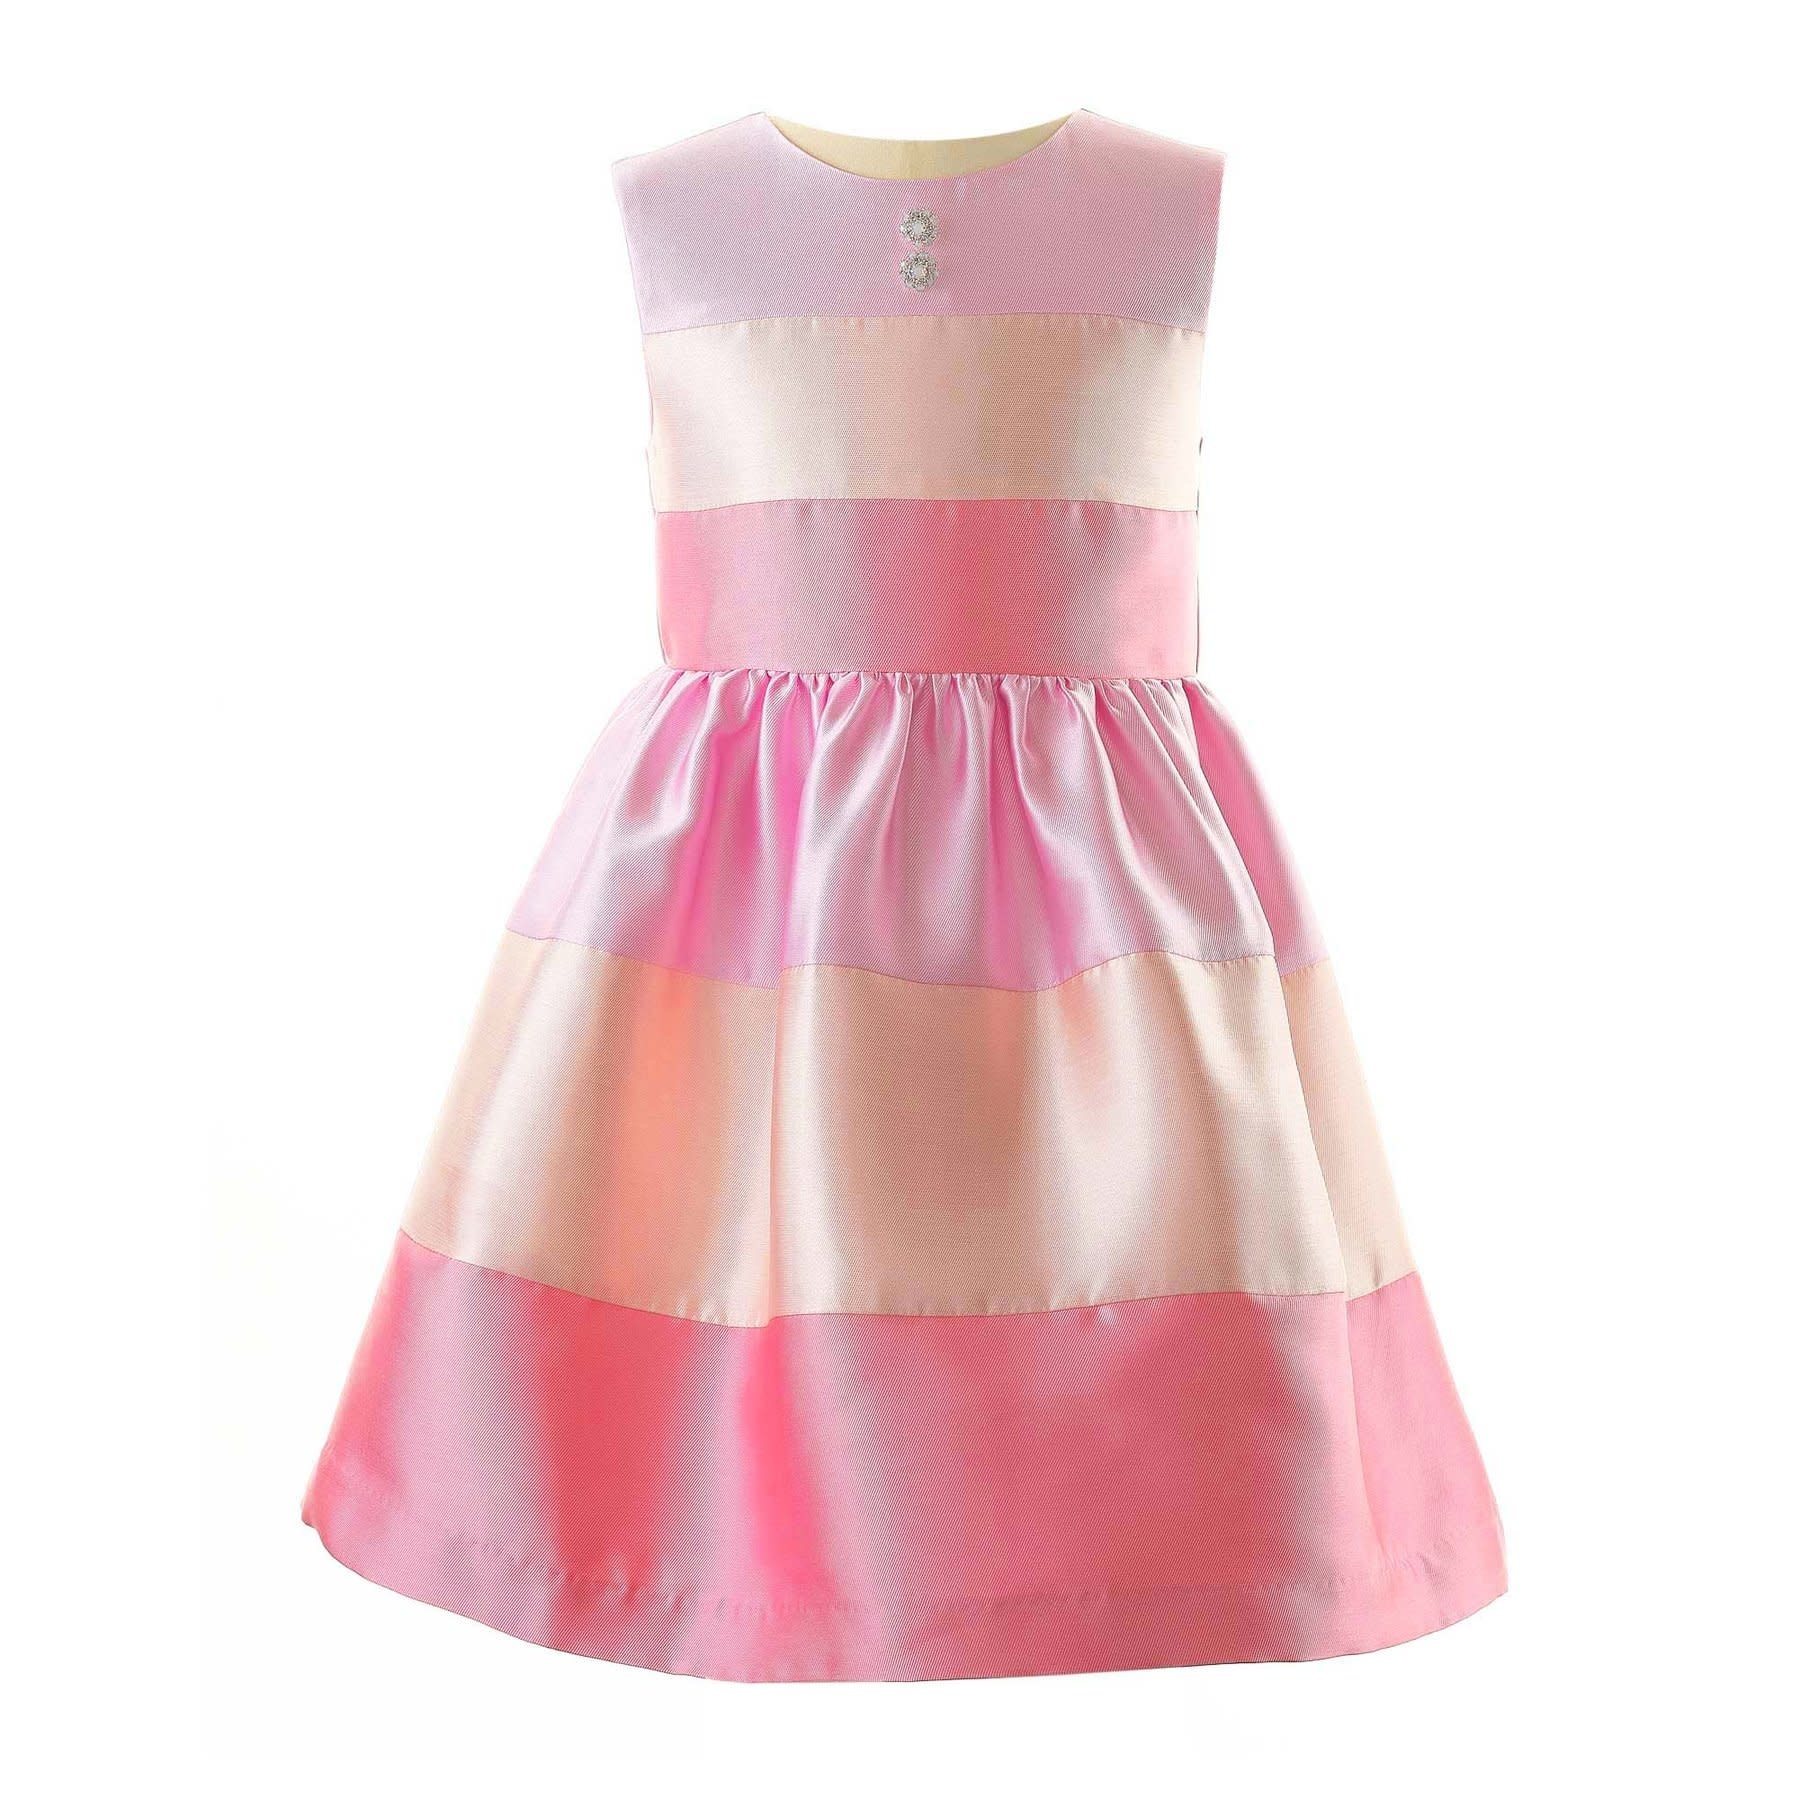 Rachel Riley Candy Stripe Party Dress